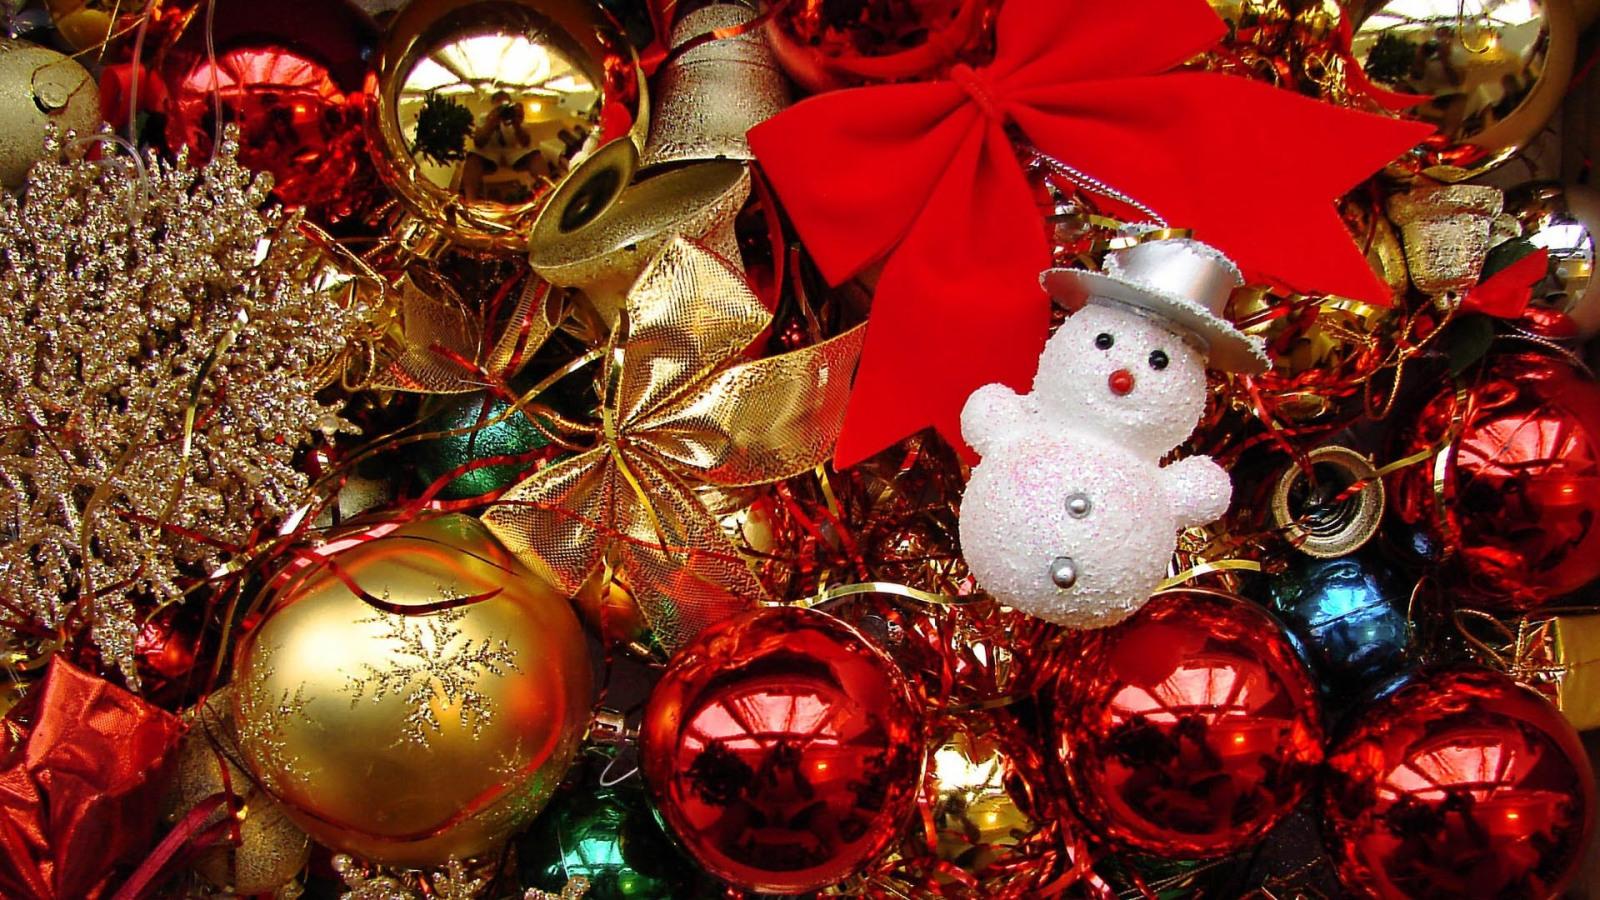 Christmas-Tree-s-1920x1080-wallpaper-wp3403906